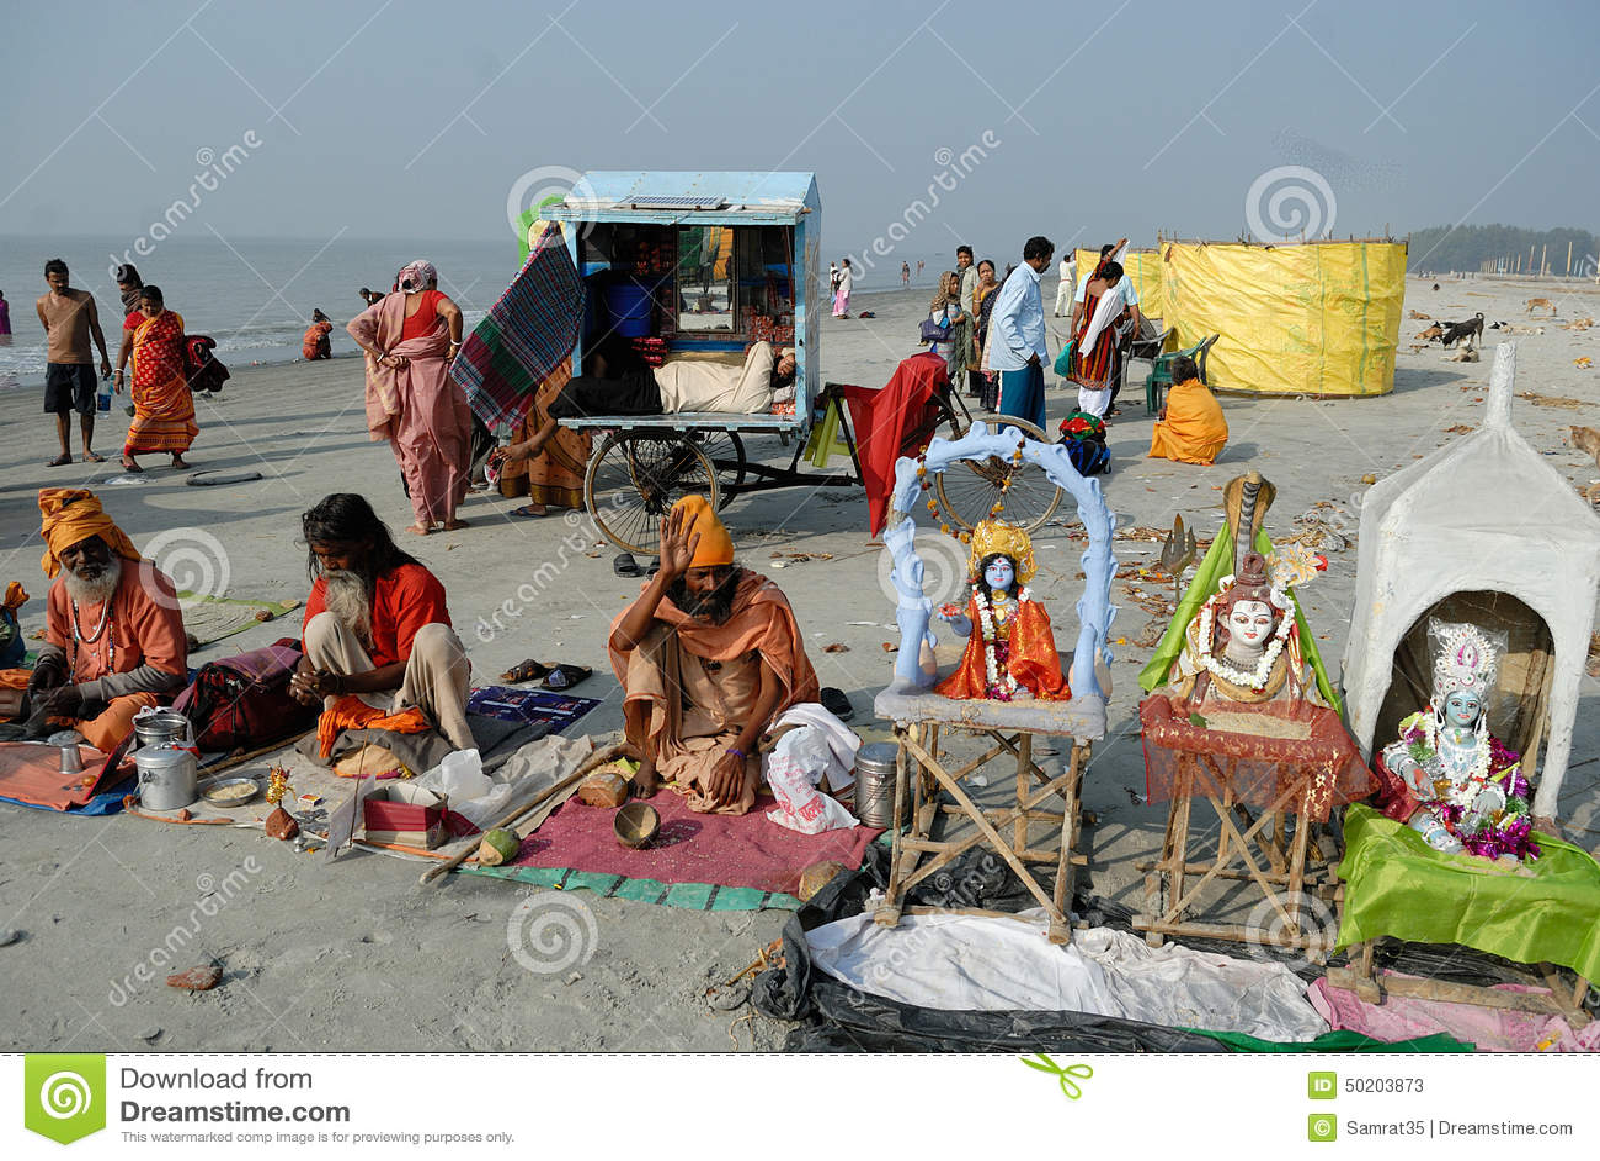 Ganga Sagar Festival in India 45